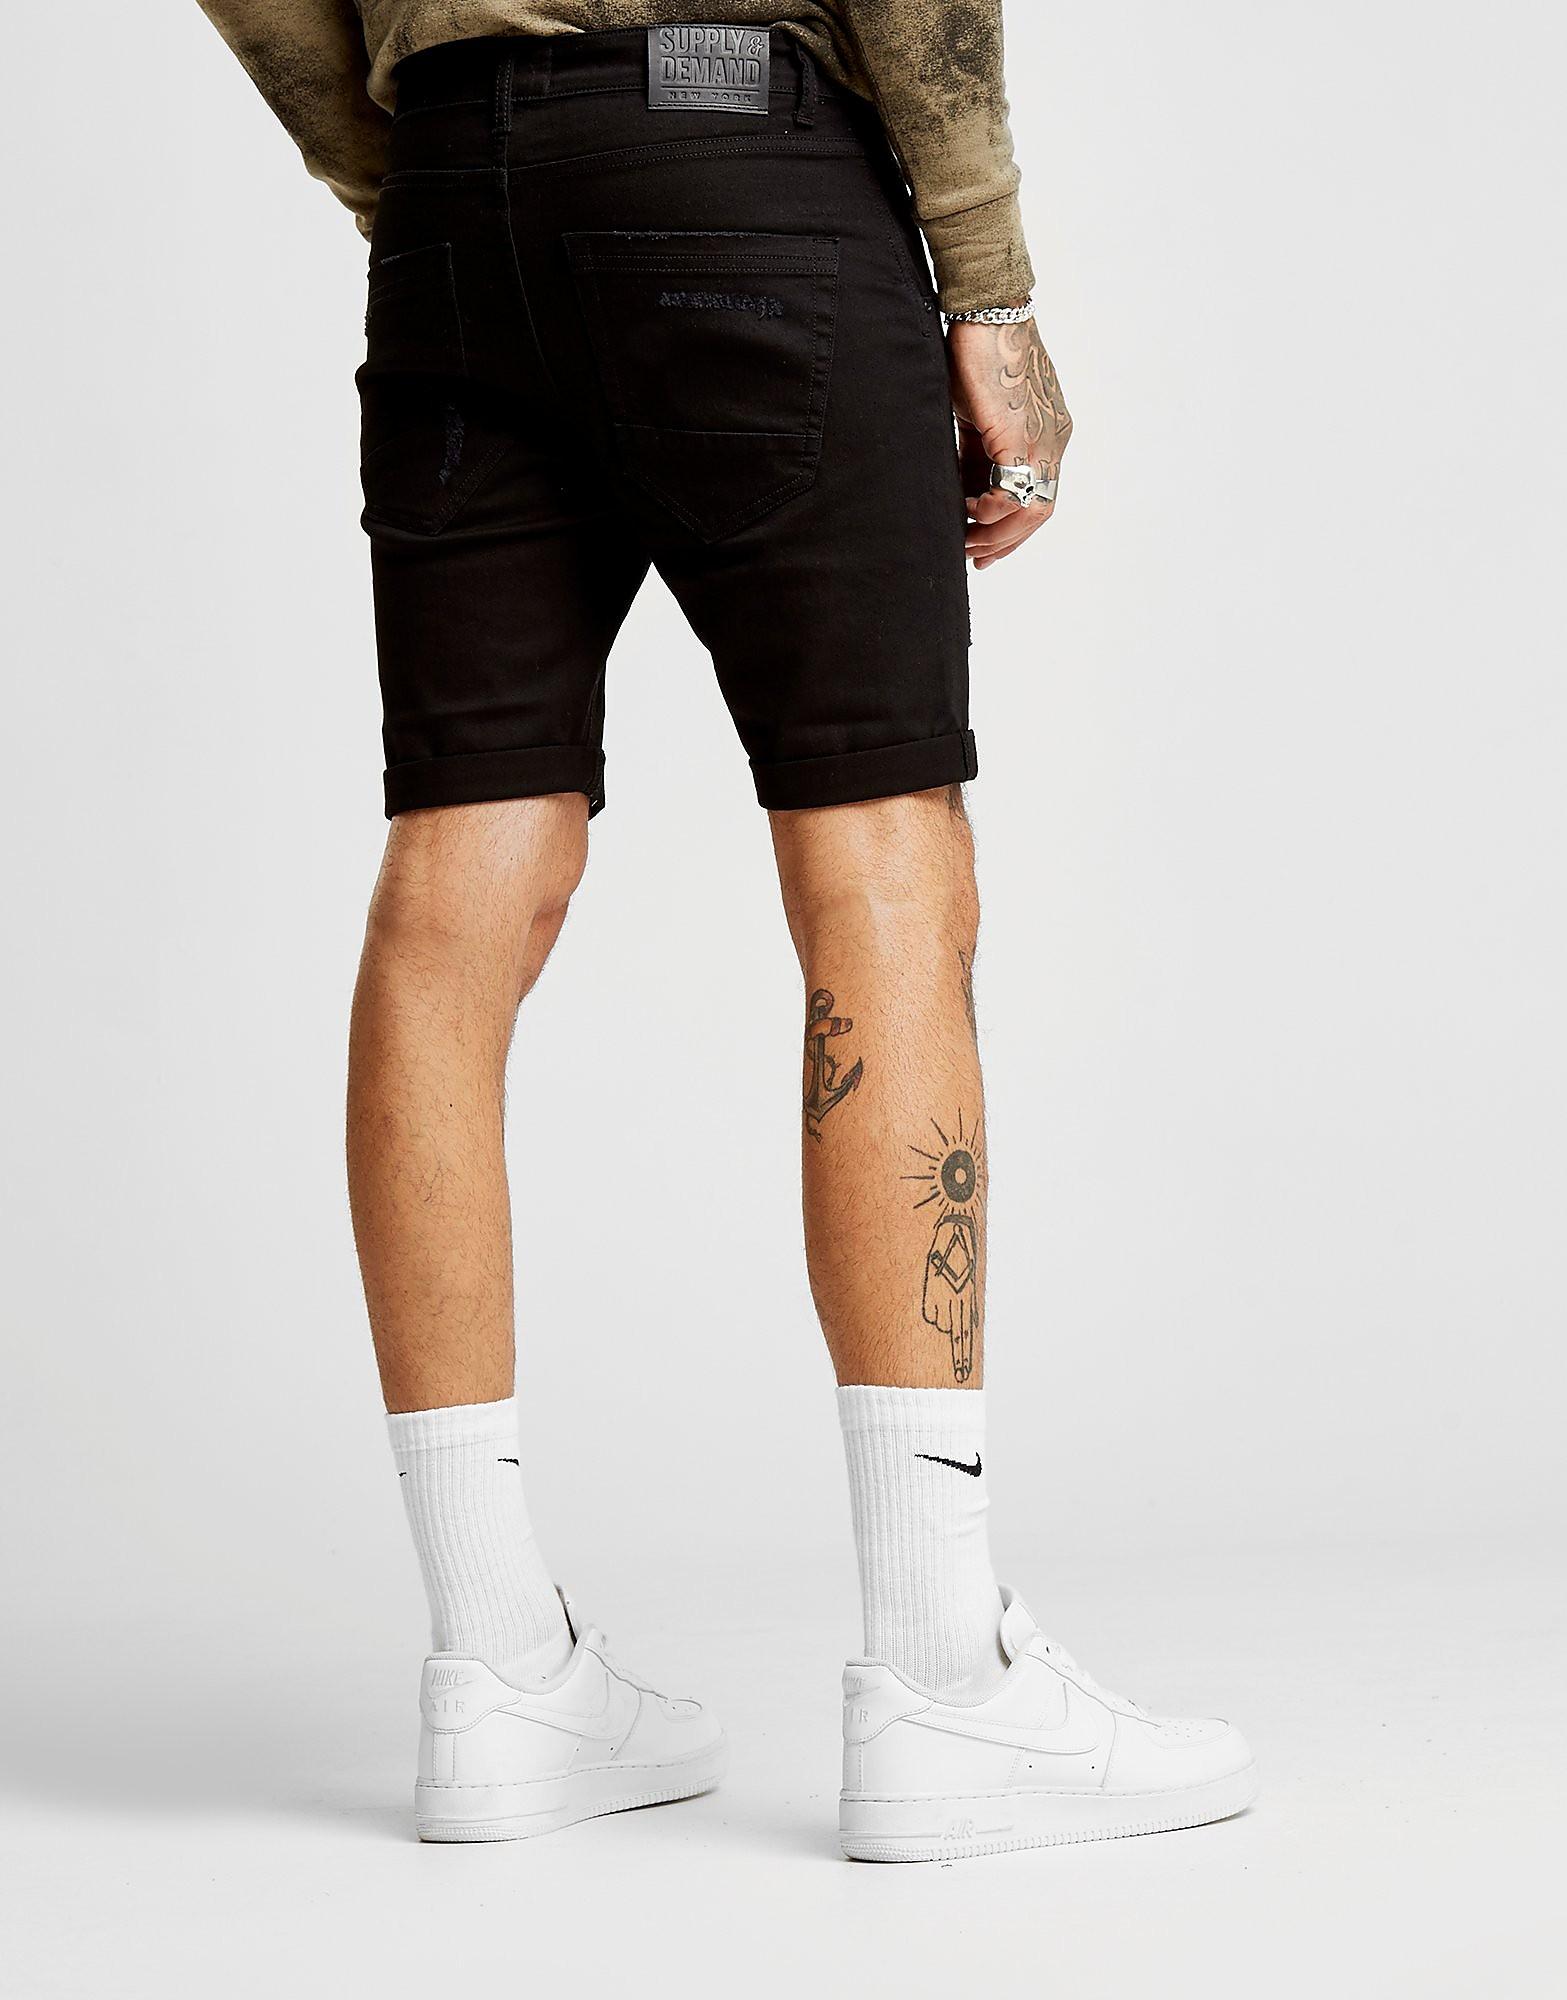 Supply & Demand Benji Denim Shorts